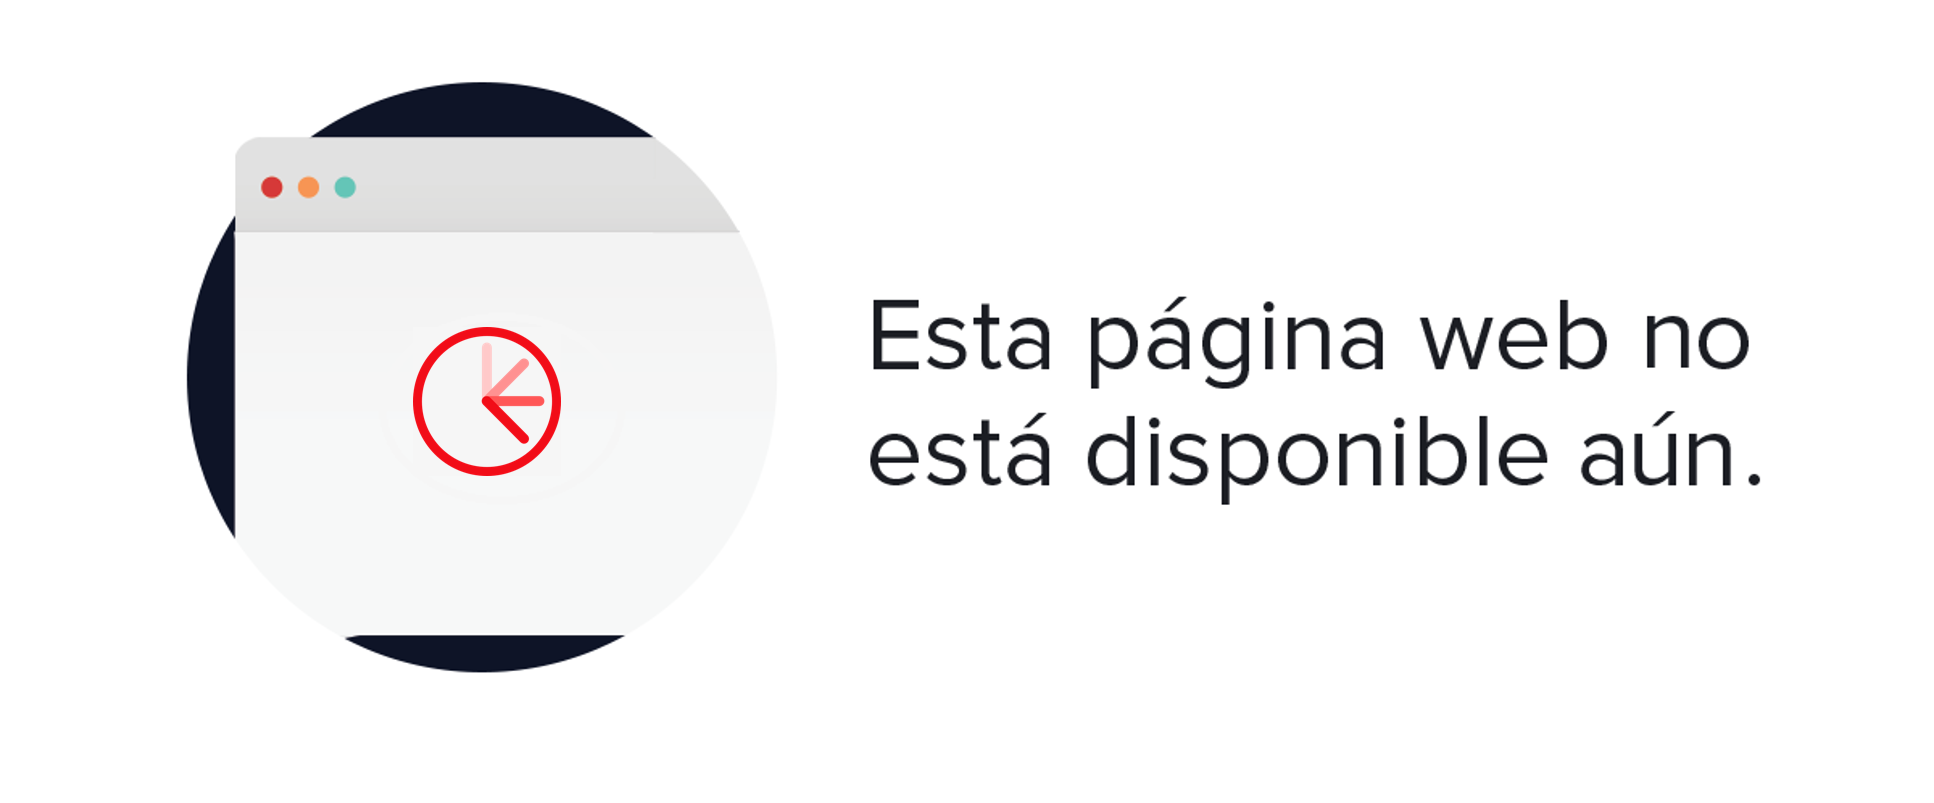 OXXO - Falda de mujer OXXO asimétrica con cintura gomada Blanco 8681613245242 - JNHATNW